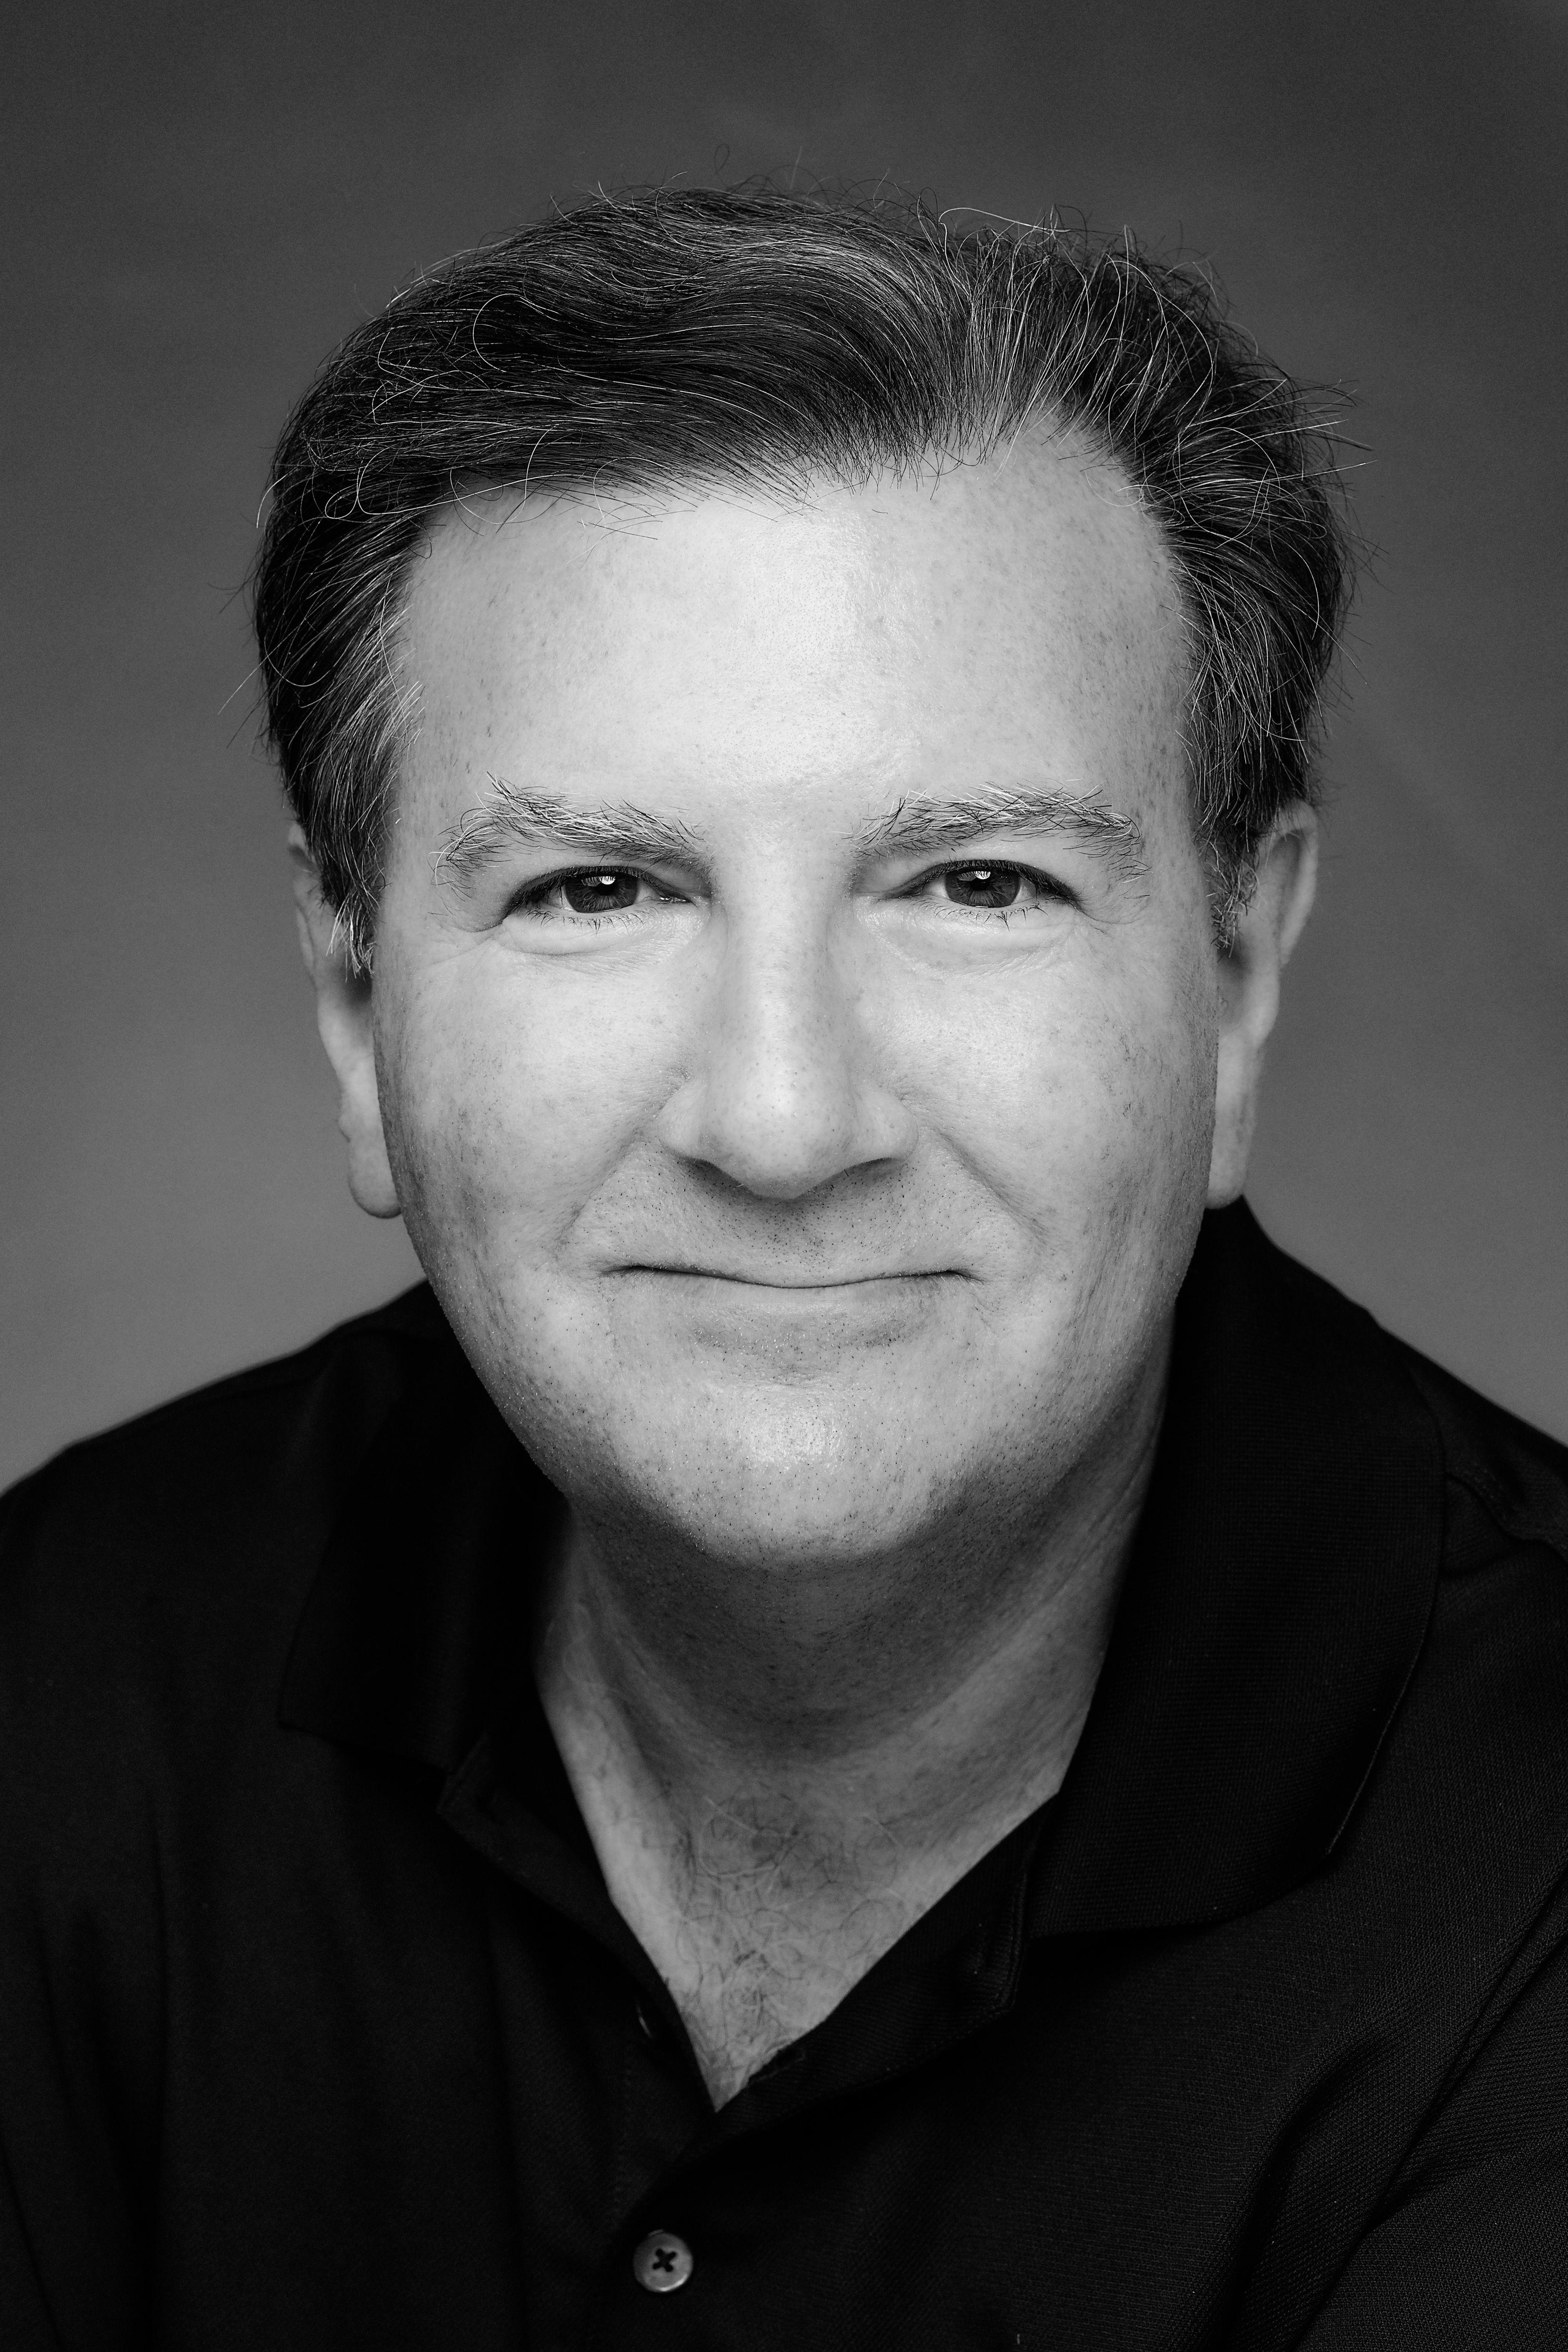 Jeff Rovner